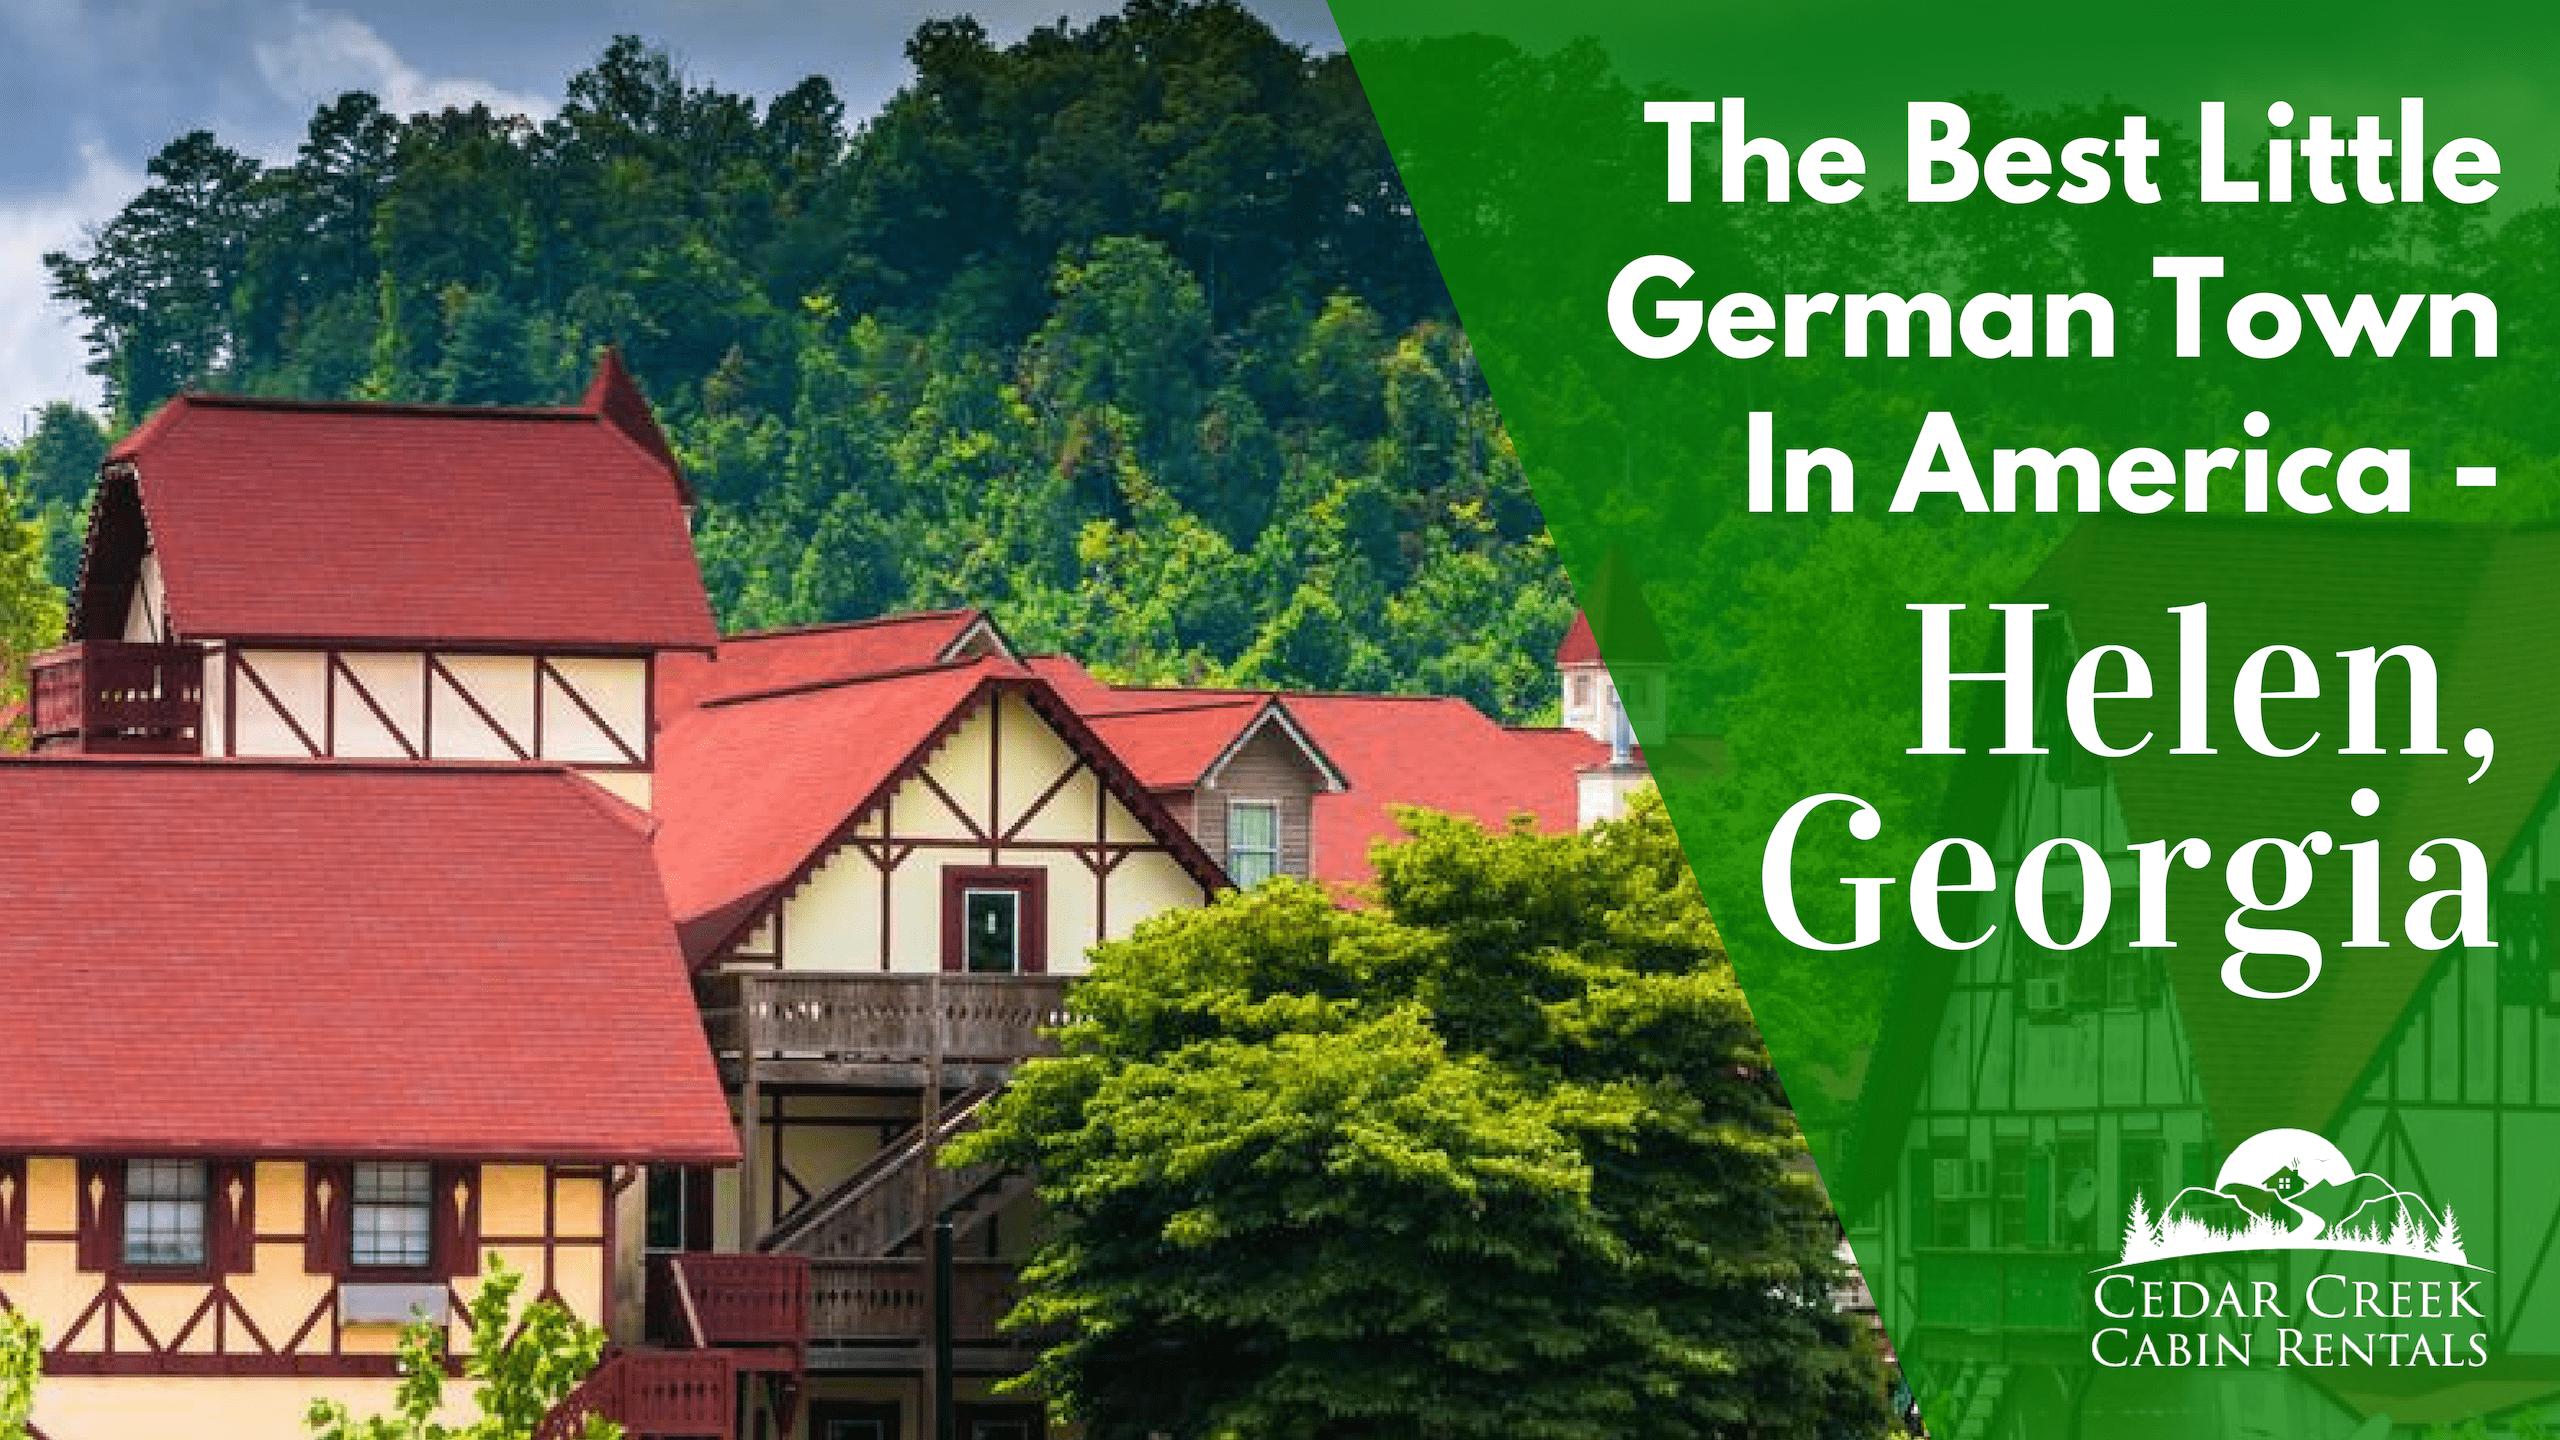 Best-Little-German-Town-in-America-Cedar-Creek-Cabin-Rentals-Helen-Georgia-Blog-Banner